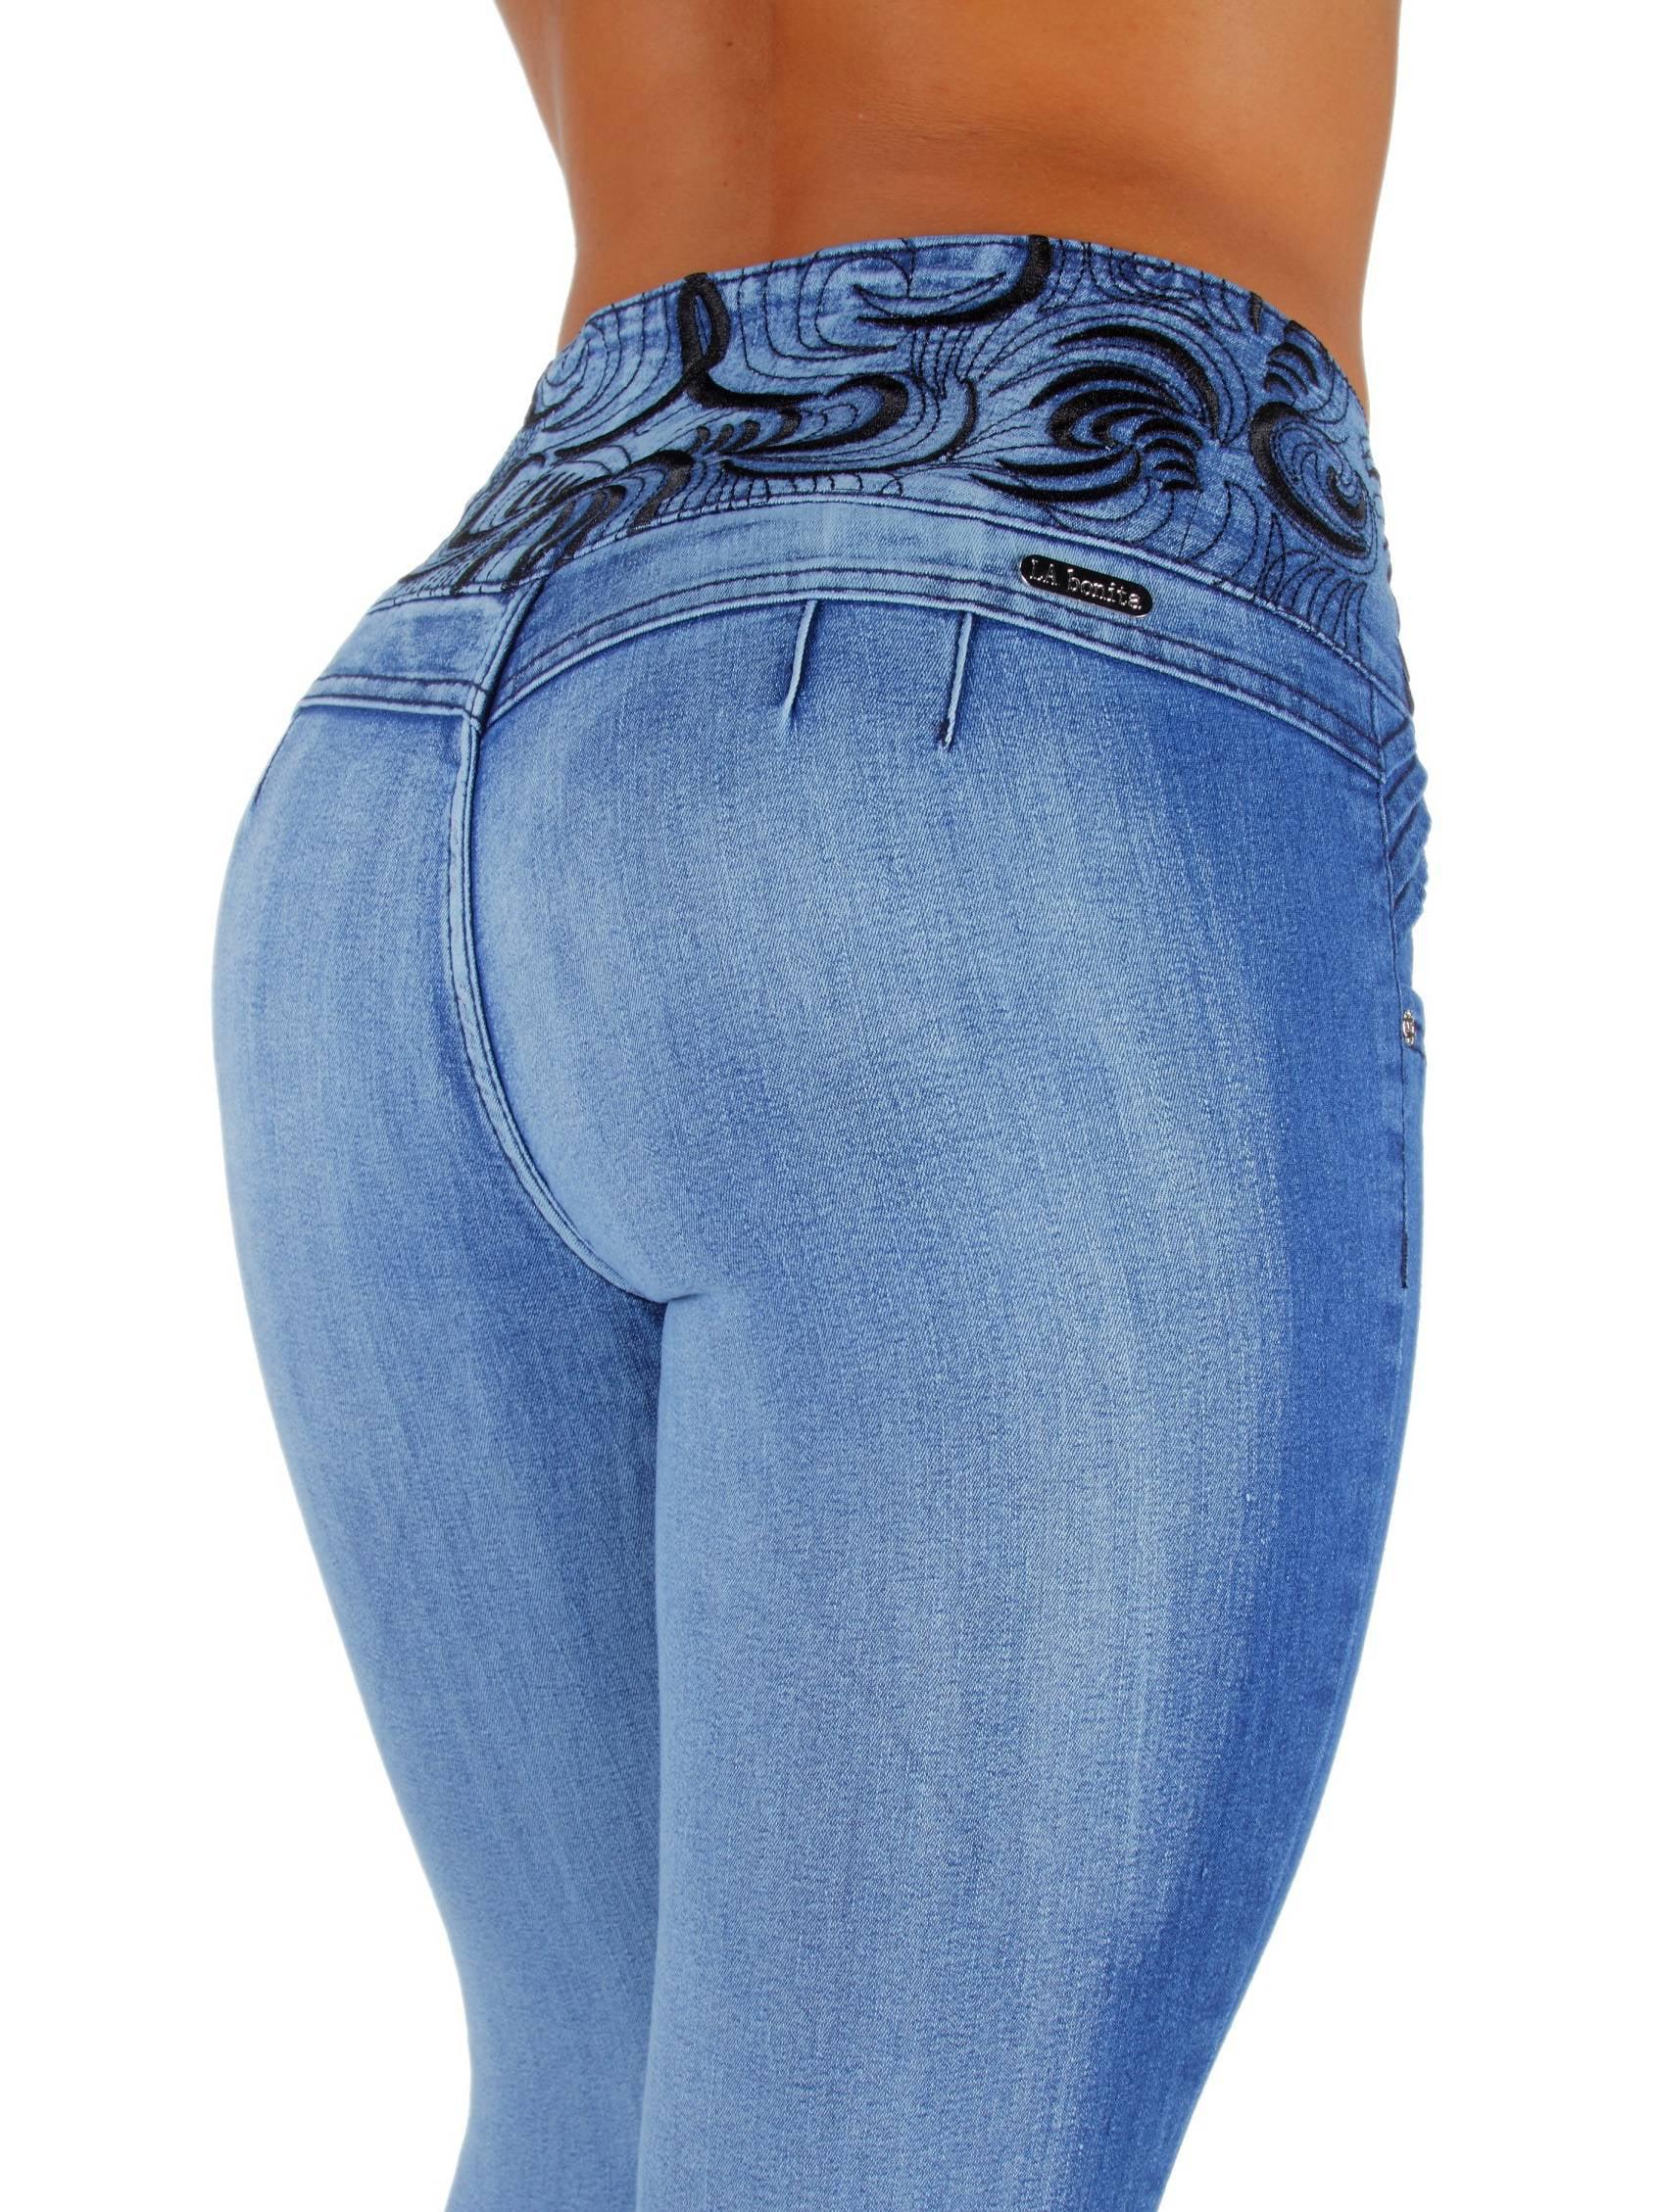 Style LA6A078MS - Plus Size, Mid Waist, Colombian Design, Butt Lift Skinny Jeans